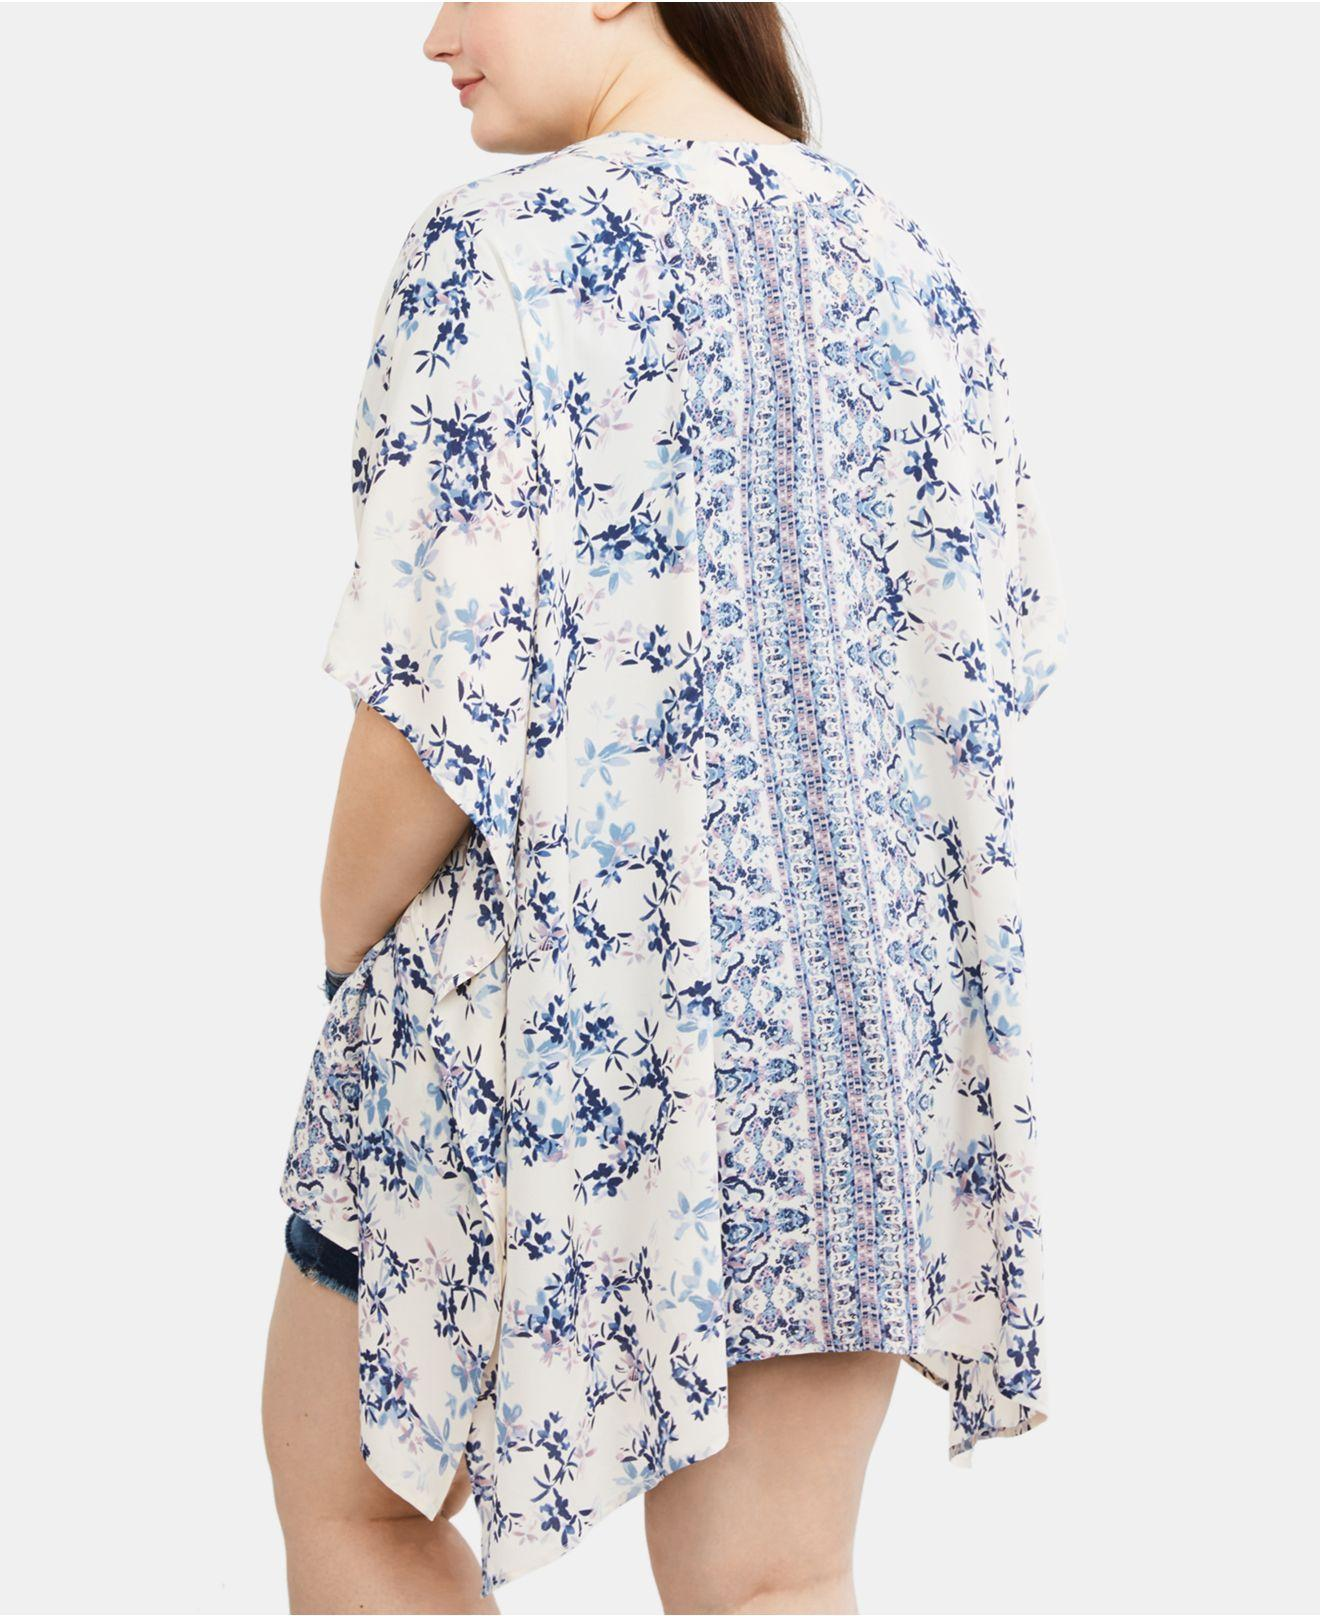 35cd38ef8ad Lyst - Jessica Simpson Maternity Plus Size Printed Kimono Blouse in Blue